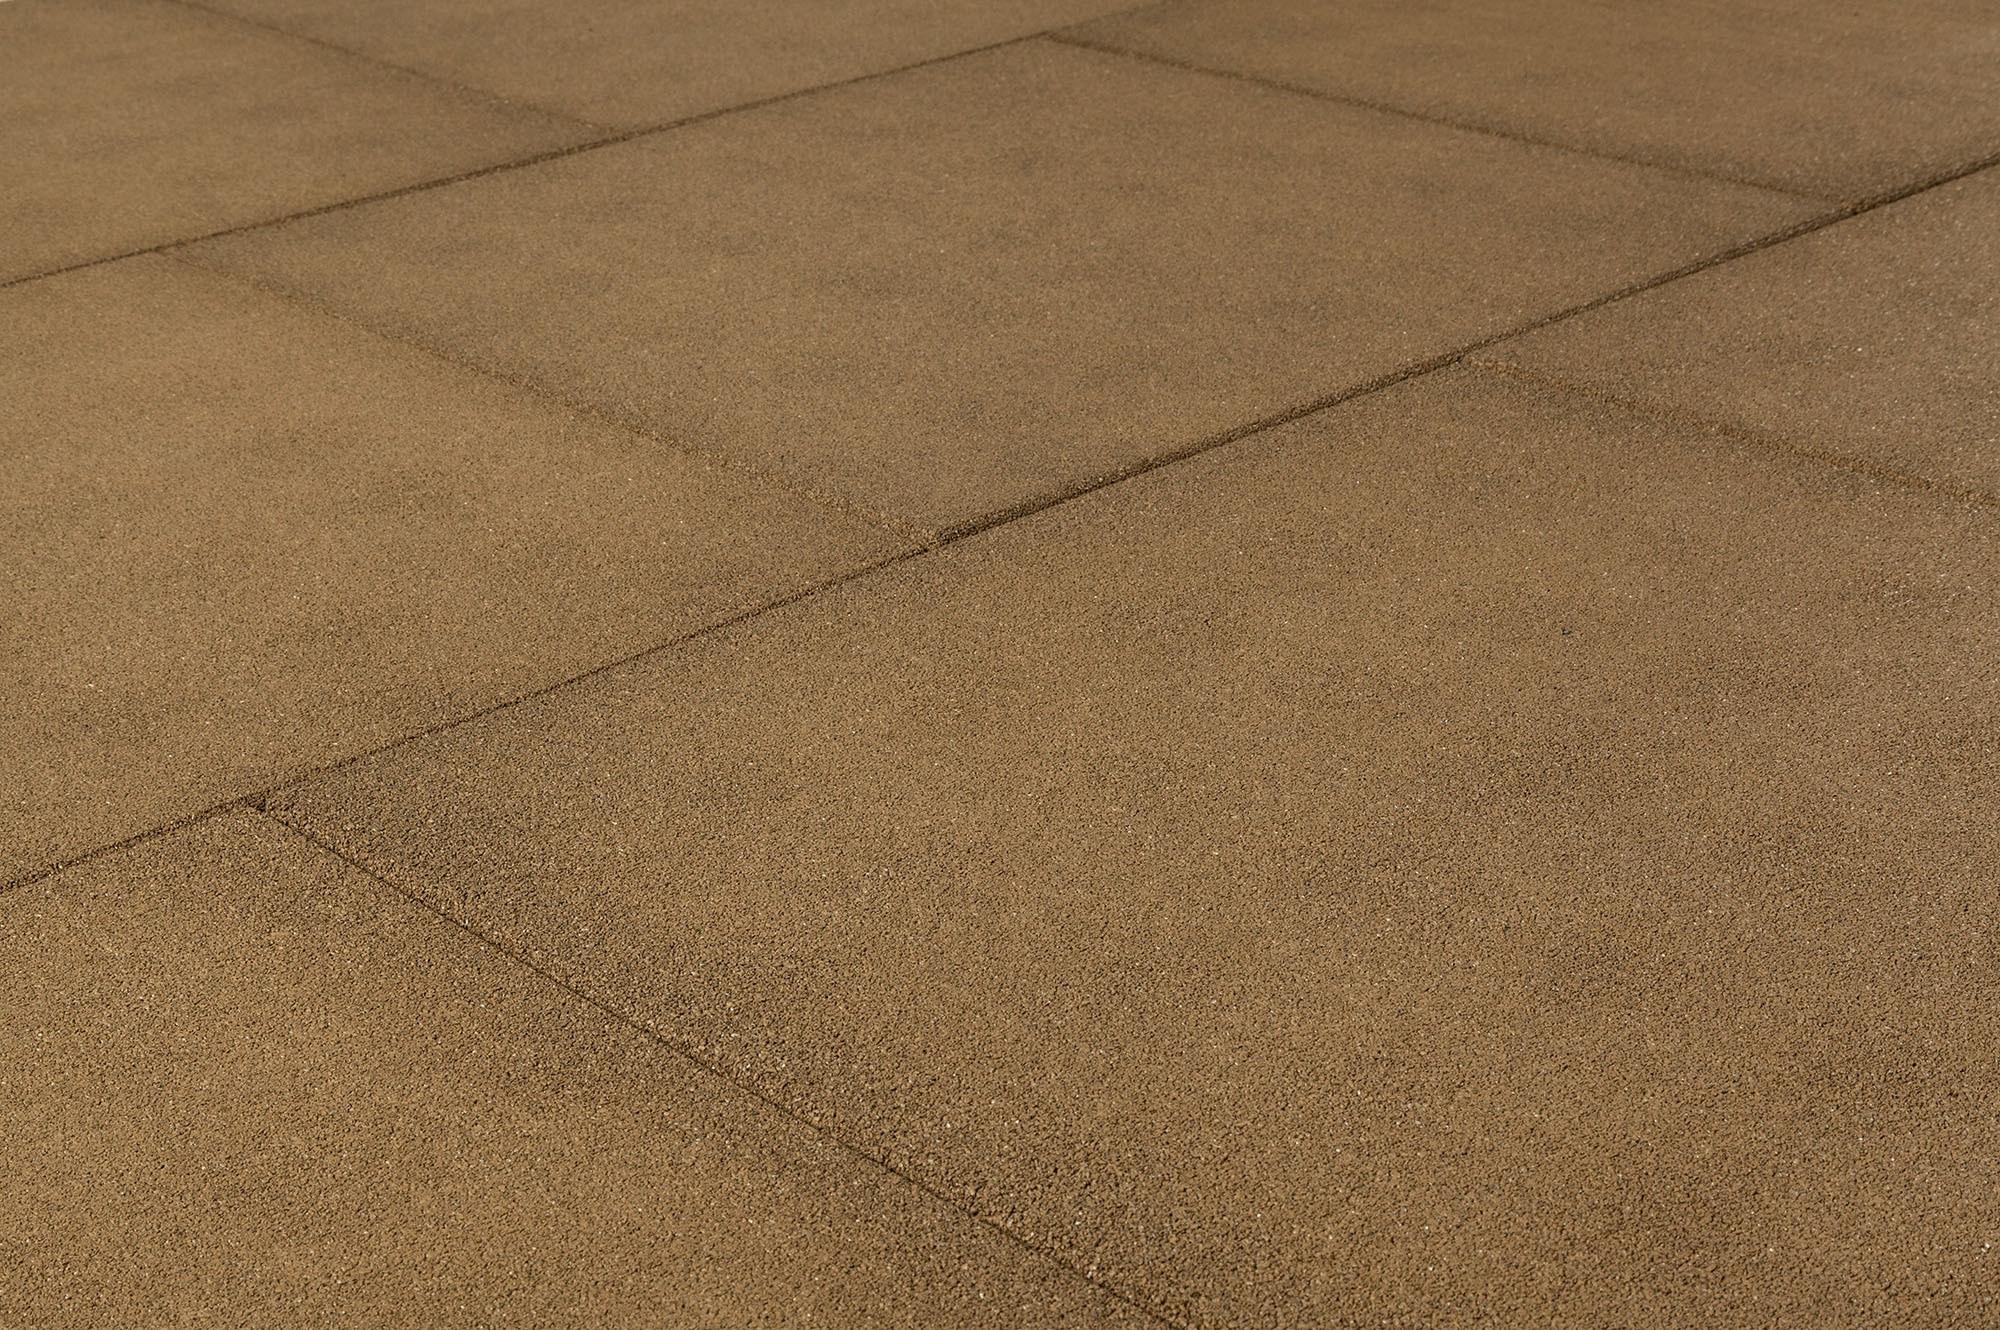 Brava Outdoor Prestige Rubber Tiles 24x24x2 12 Rubber